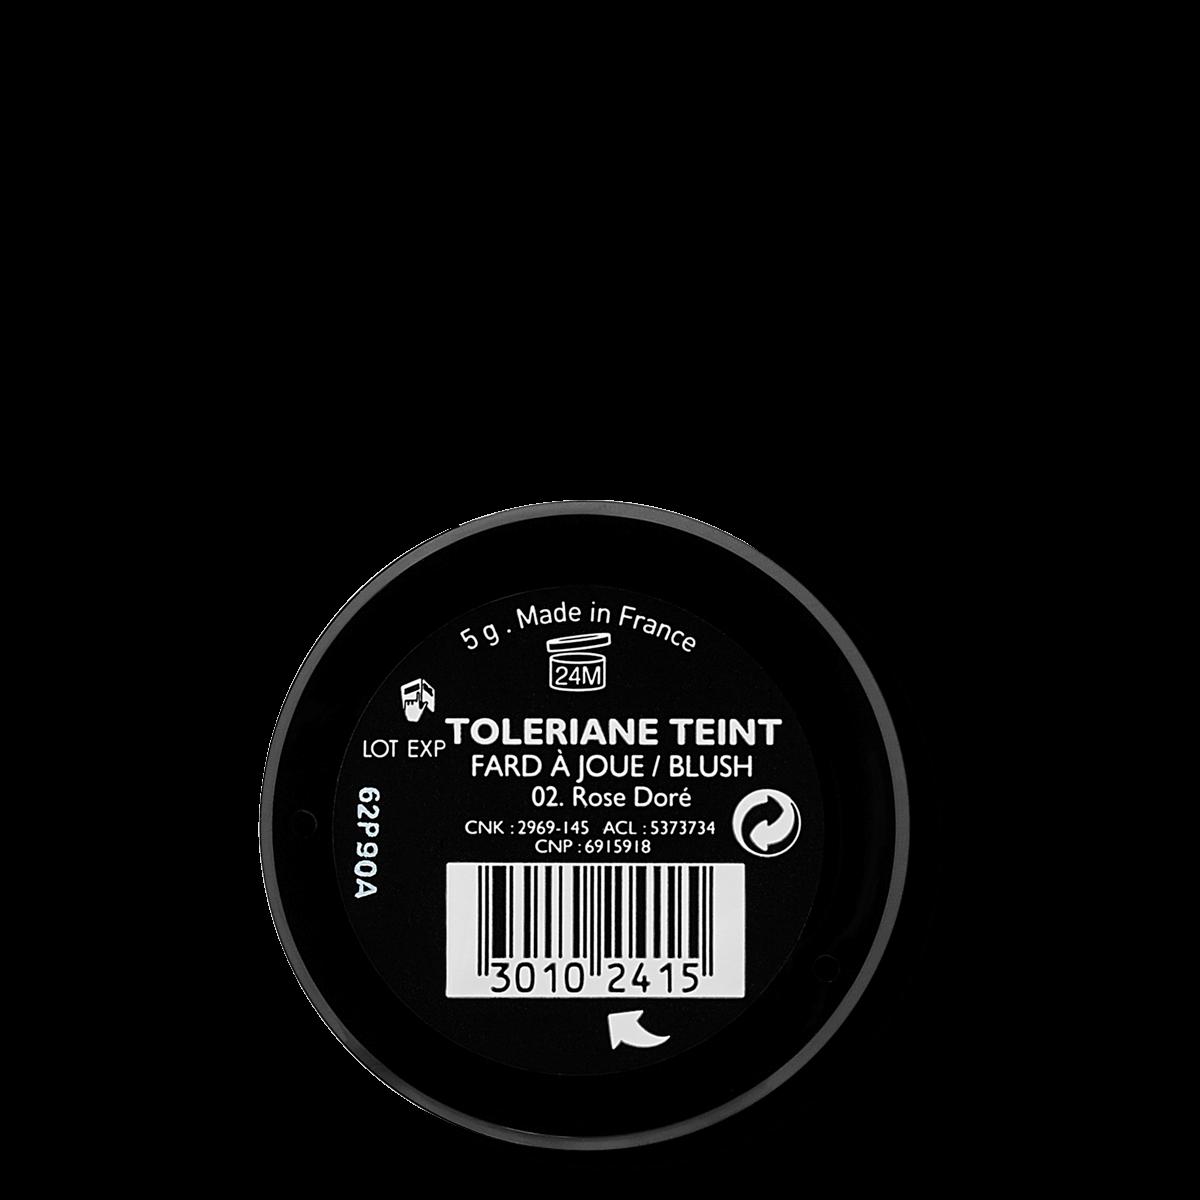 La Roche Posay Sensitiv Toleriane Makeup BLUSH GyldenPink 30102415 B